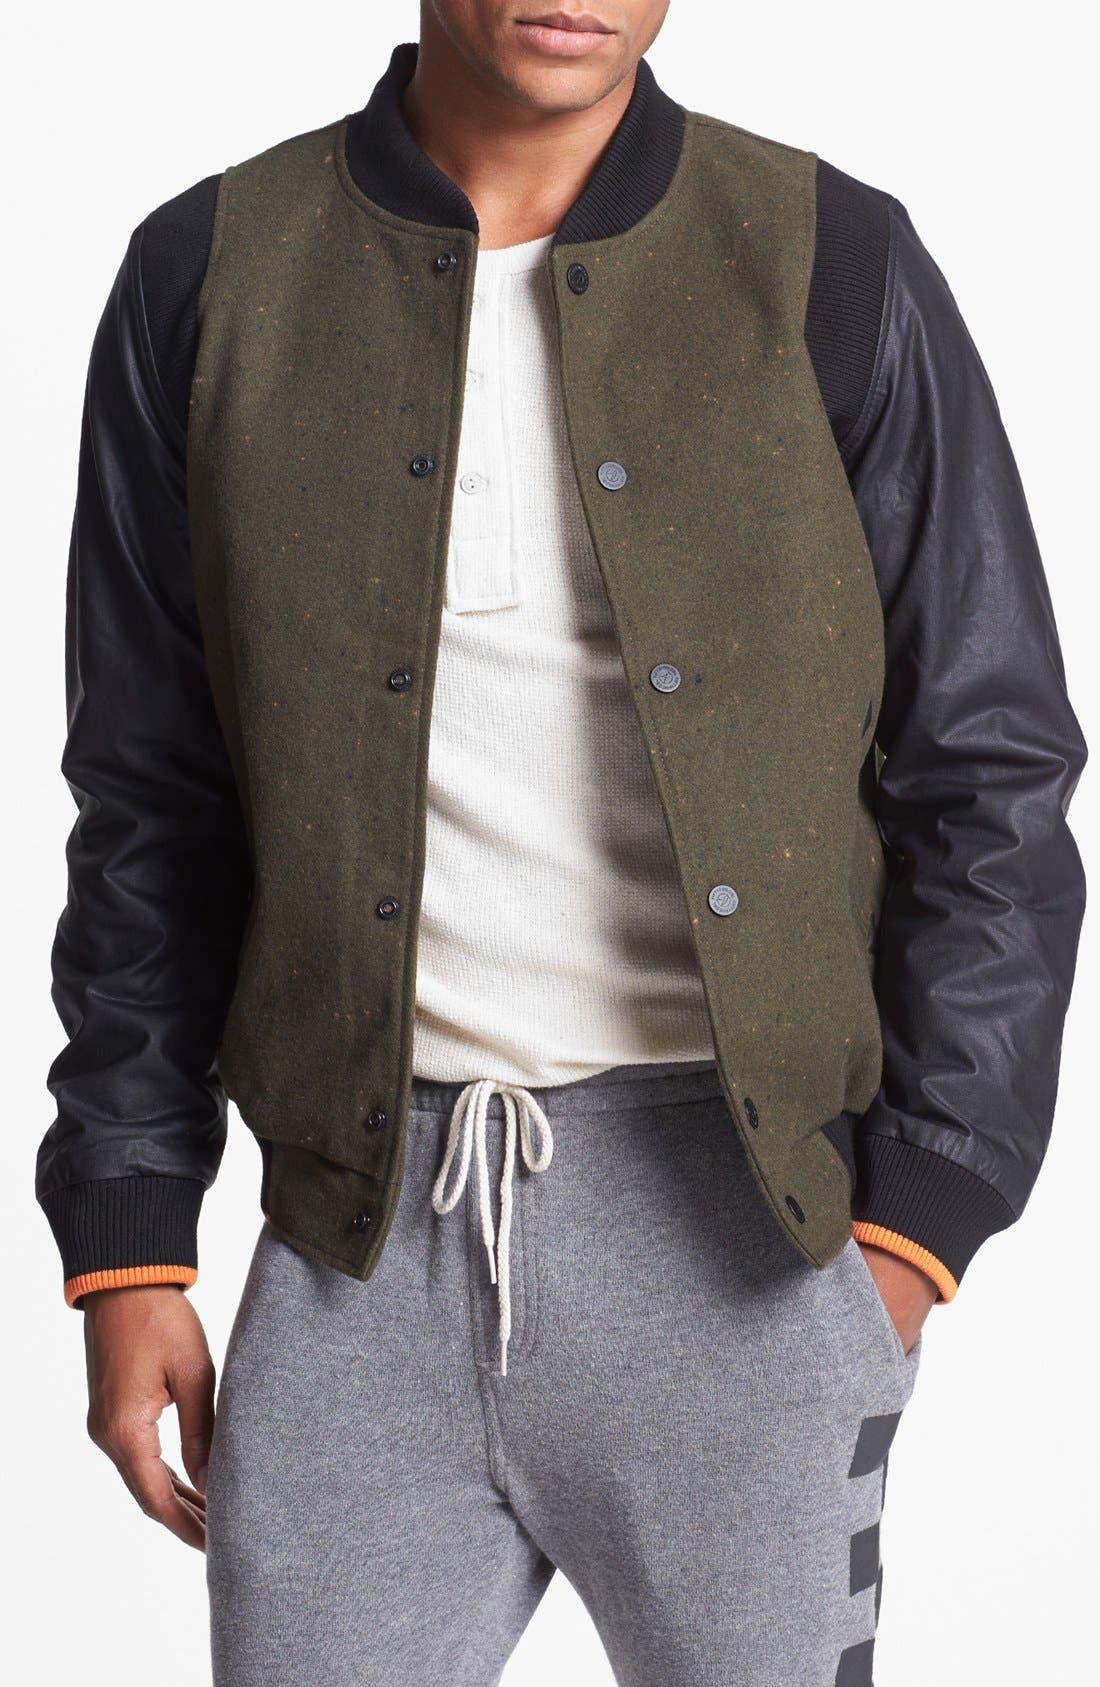 Main Image - 55DSL 'Jomstone' Varsity Jacket